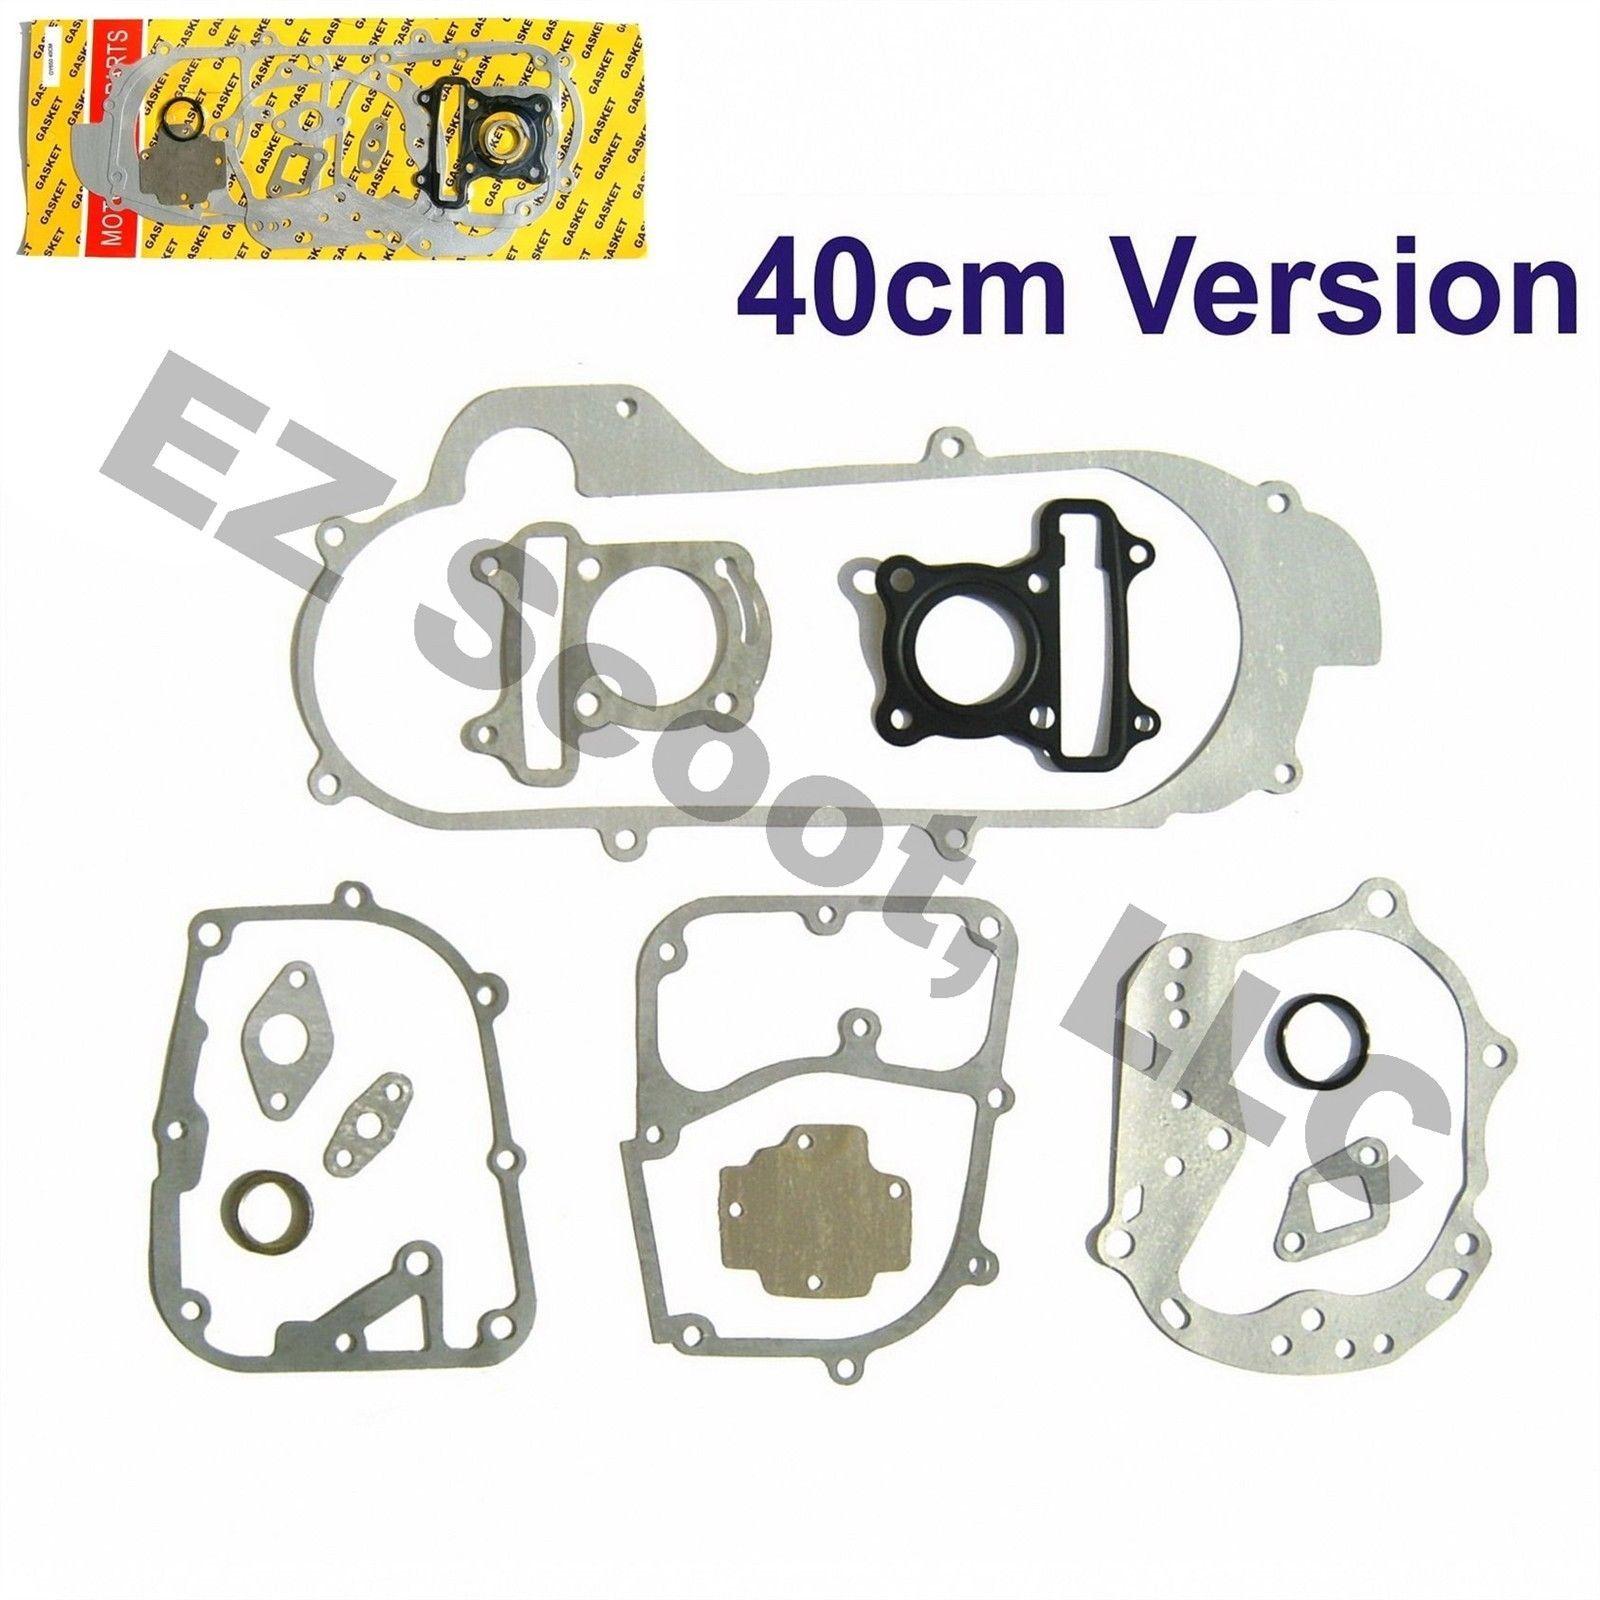 medium resolution of complete engine gasket set 50cc 40cm gy6 4 stroke chinese scooter 139 qma b ebay